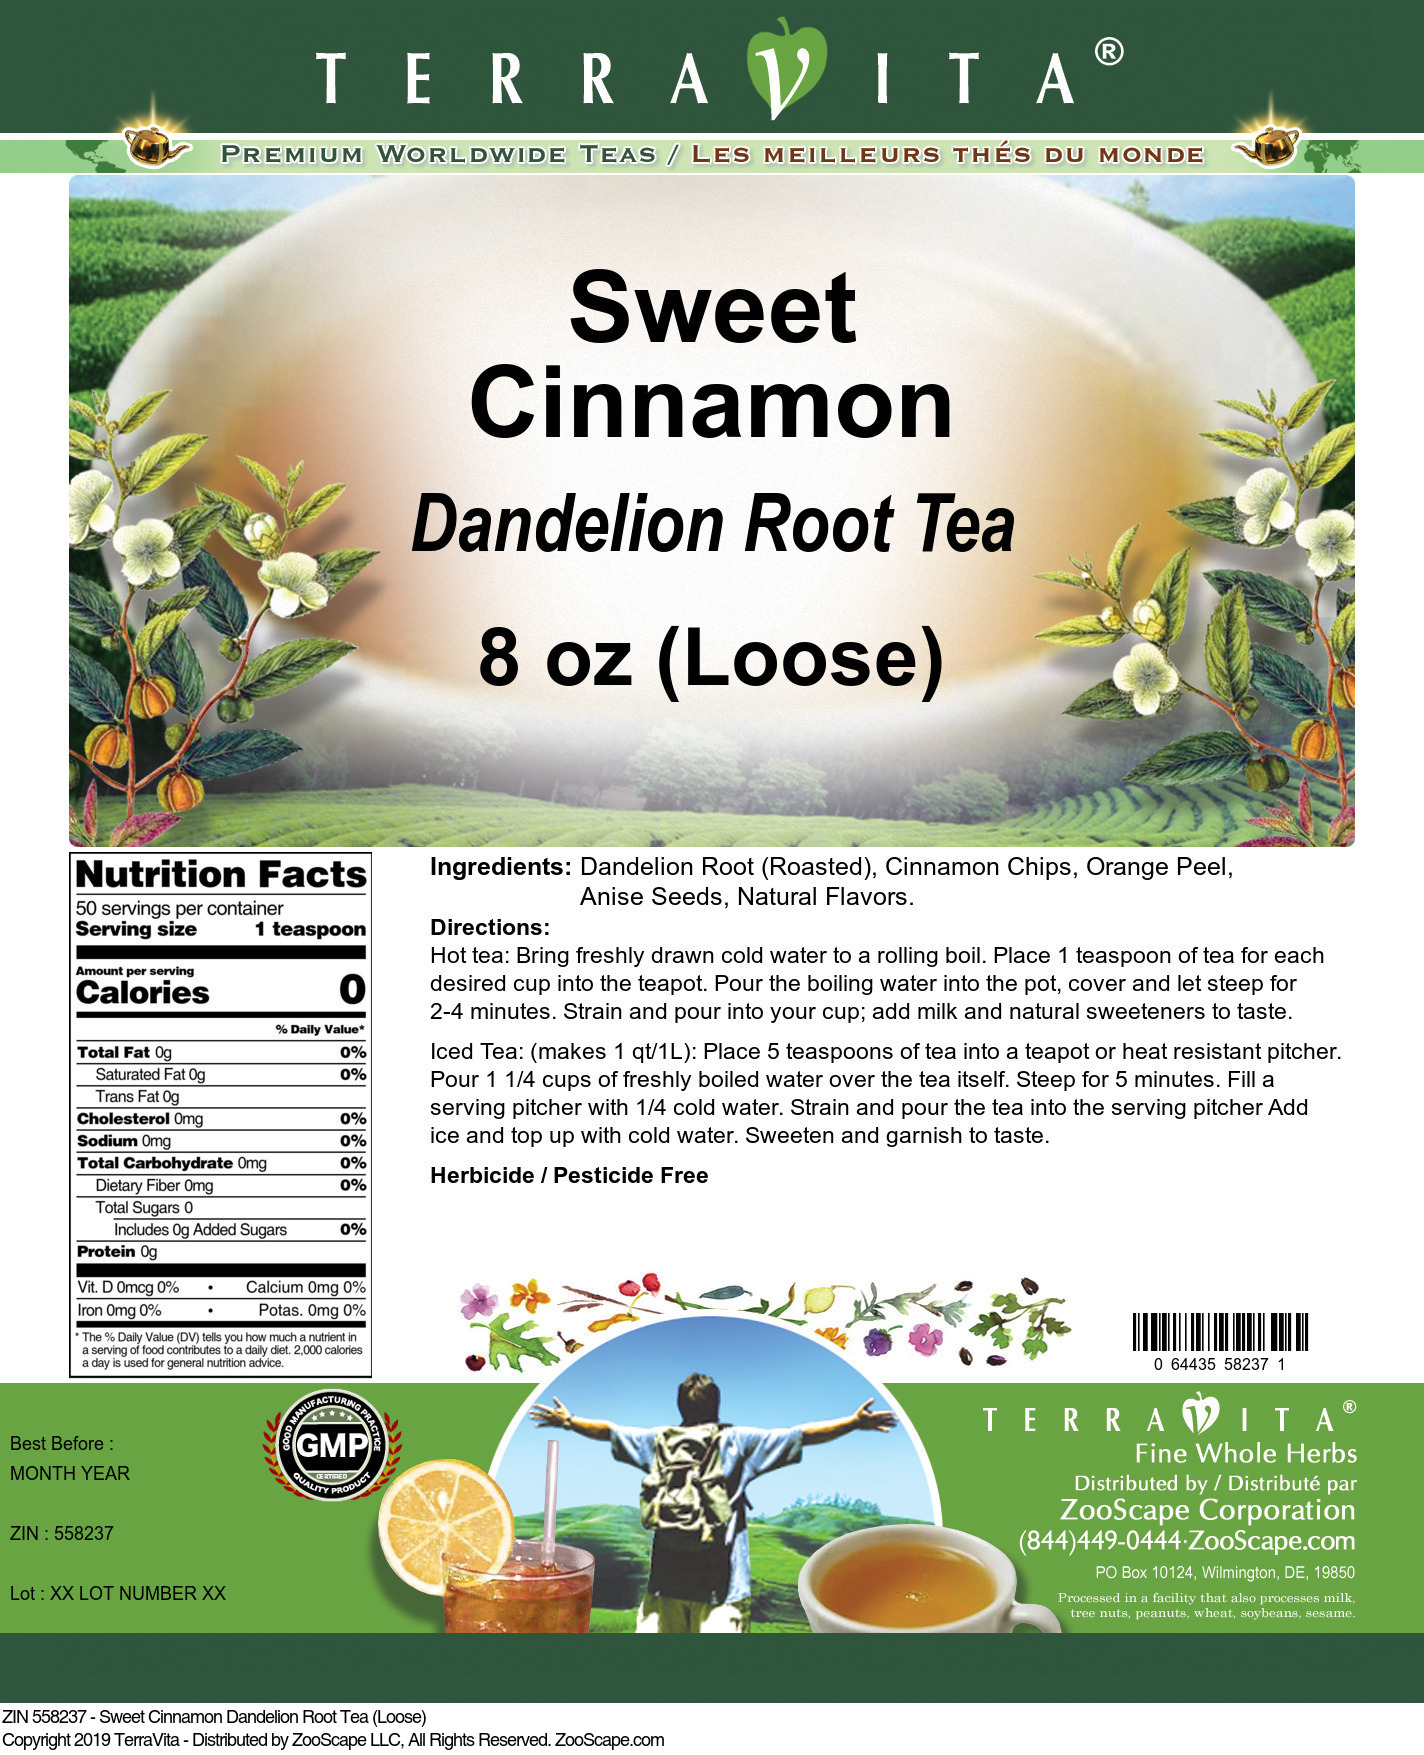 Sweet Cinnamon Dandelion Root Tea (Loose)